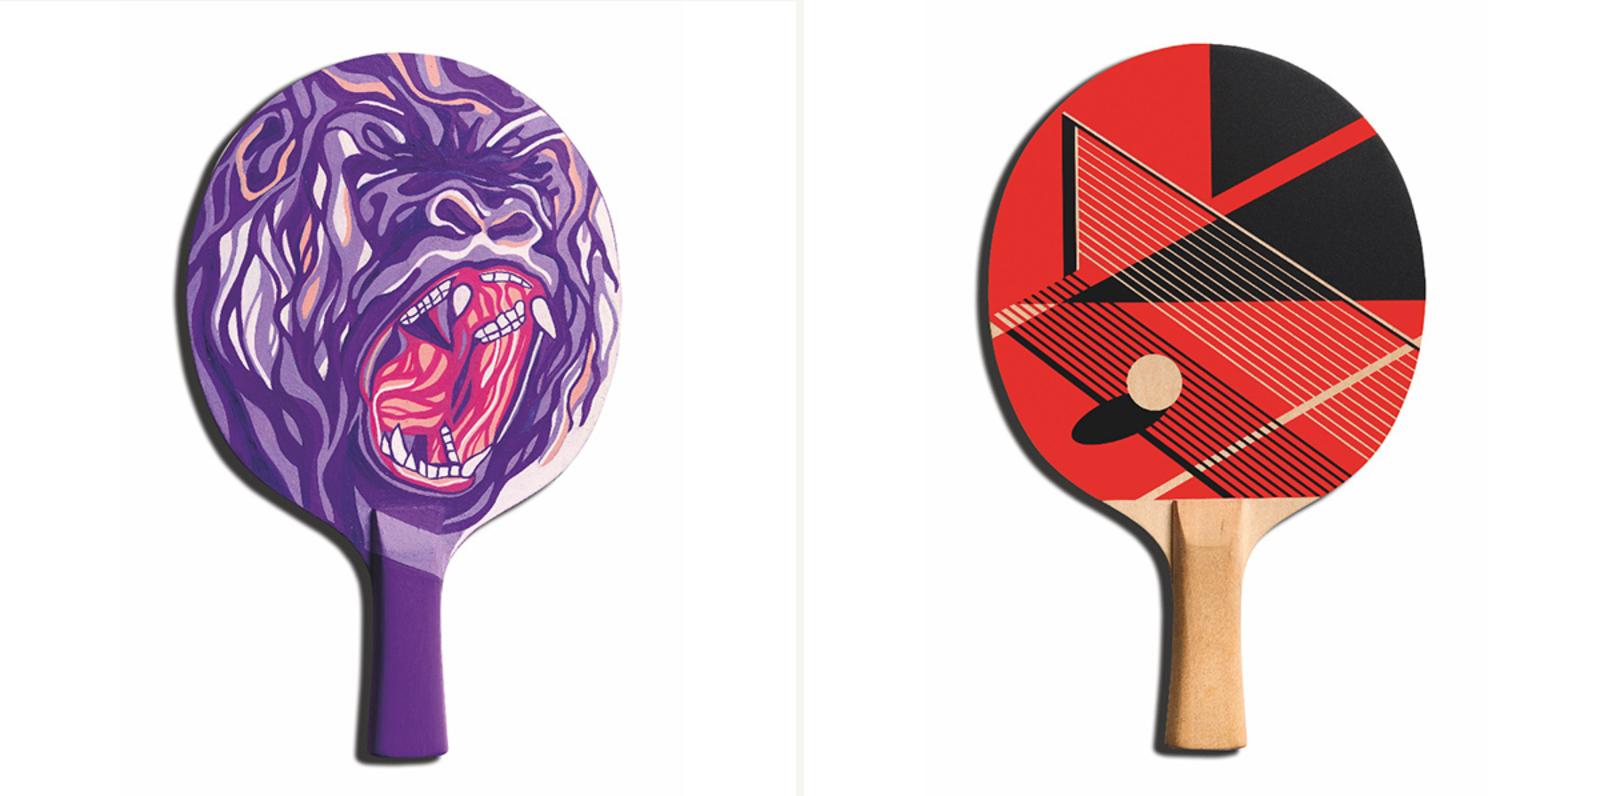 large_claudine-sullivan-malika-favre-illustrators-ping-pong-paddles